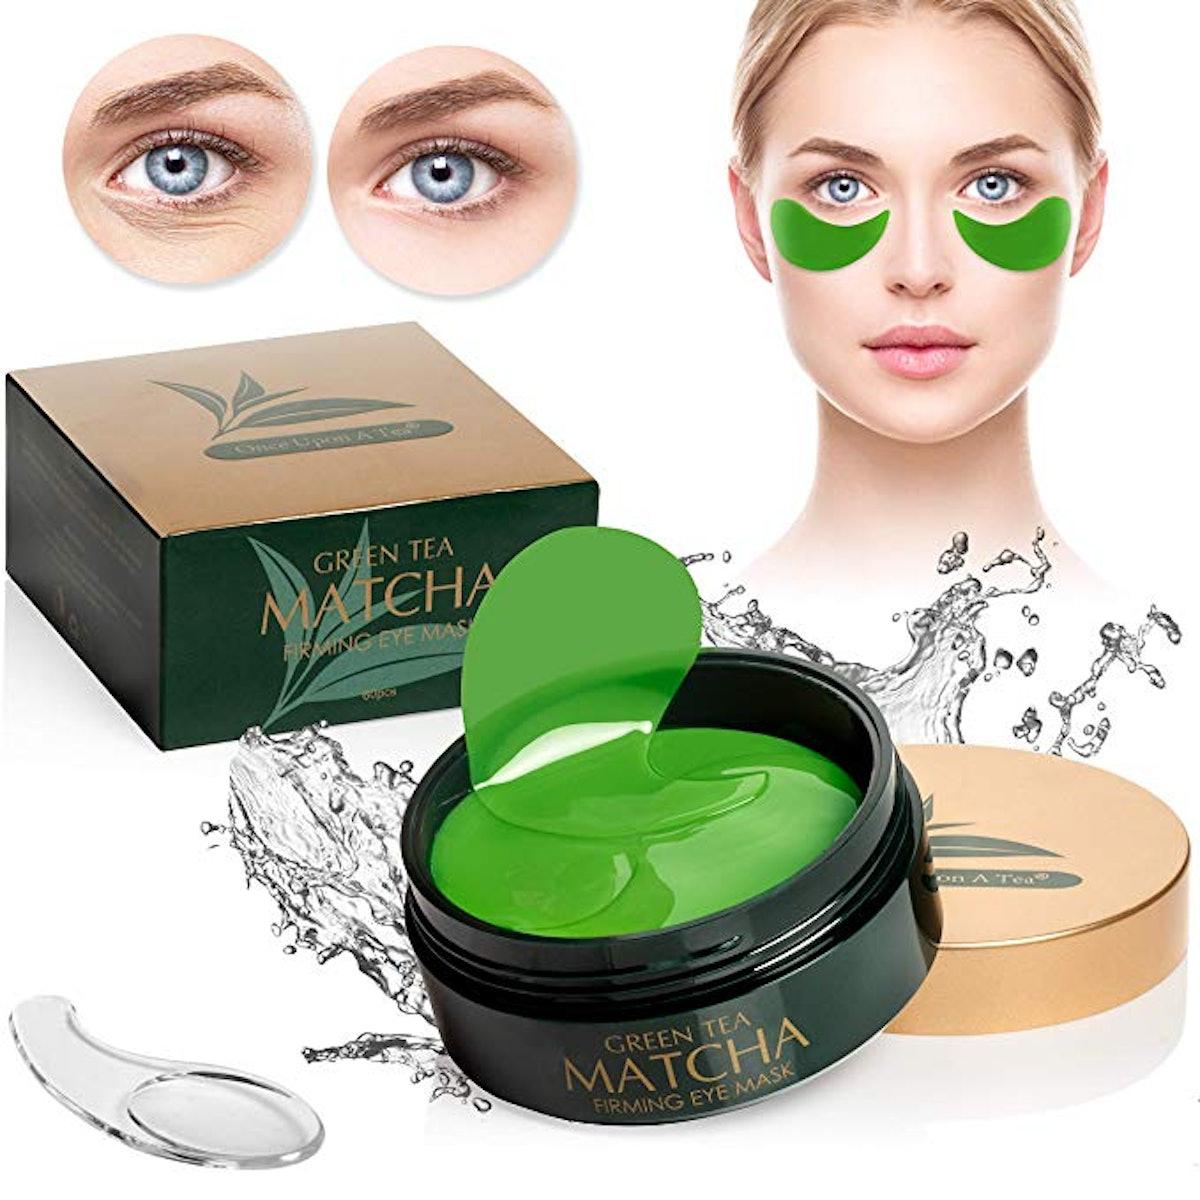 Once Upon A Tea Moisturizing Green Tea Matcha Lip Mask